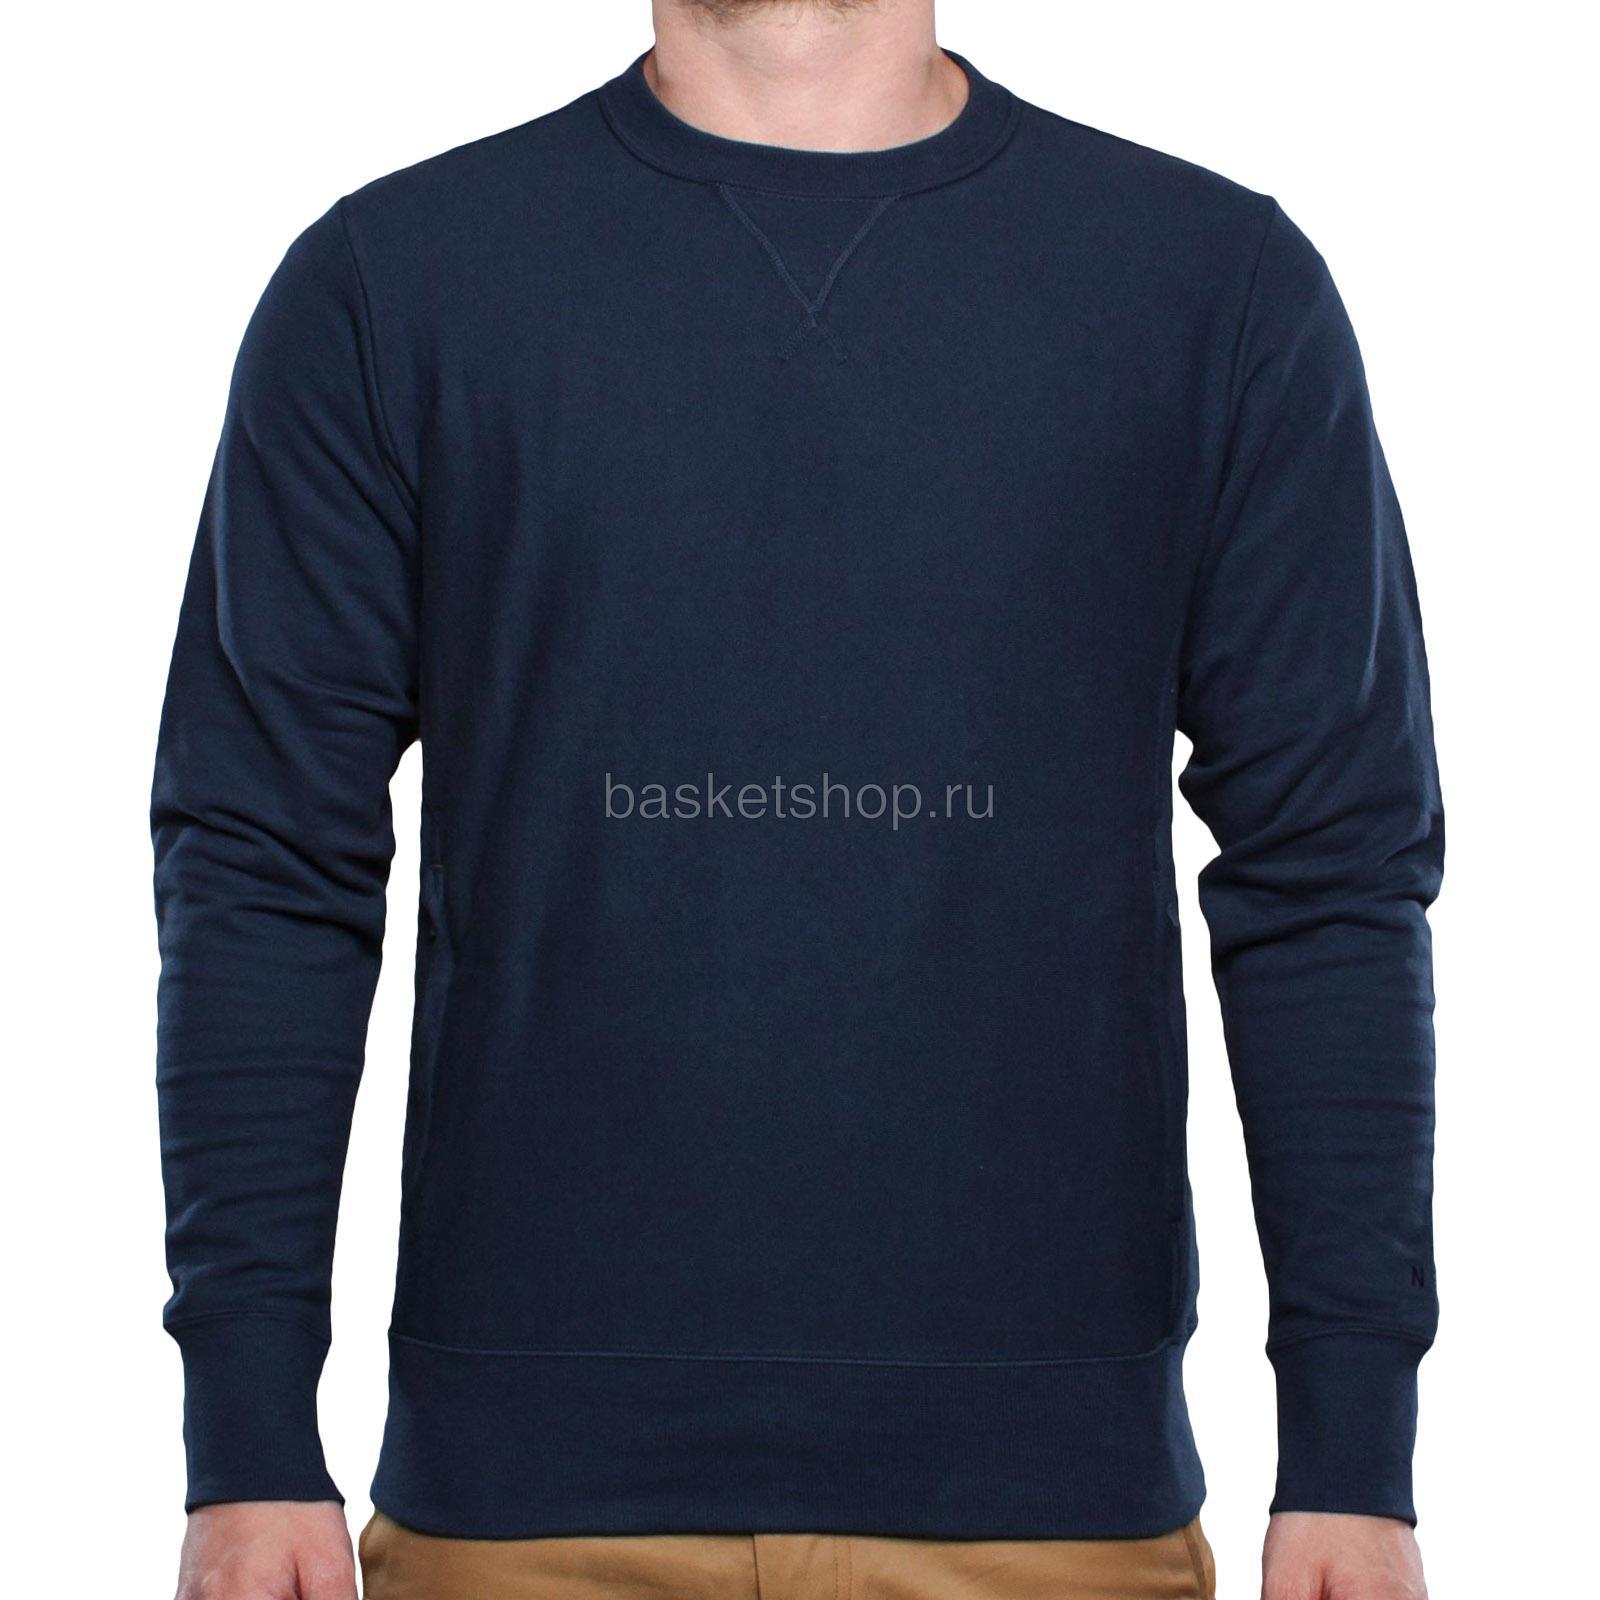 AS AW77 CrewТолстовки свитера<br>100% хлопок<br><br>Цвет: темно-синий<br>Размеры US: L